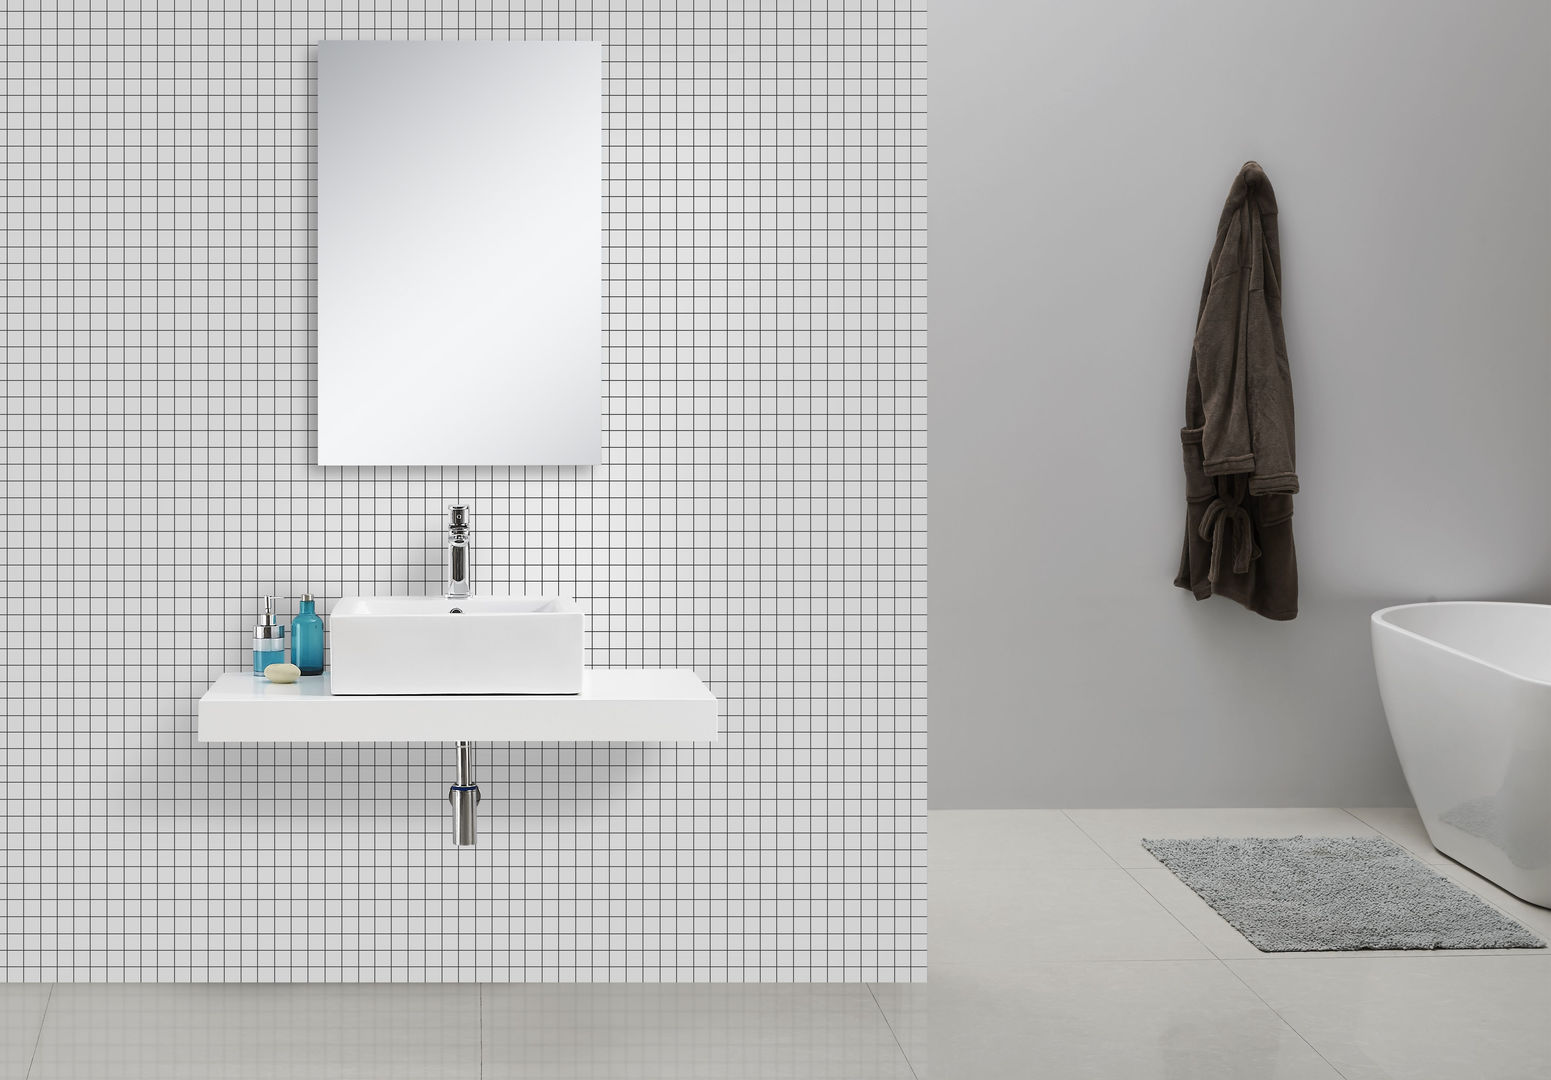 waschtischkonsole weiss 100 x 50 alphabad. Black Bedroom Furniture Sets. Home Design Ideas